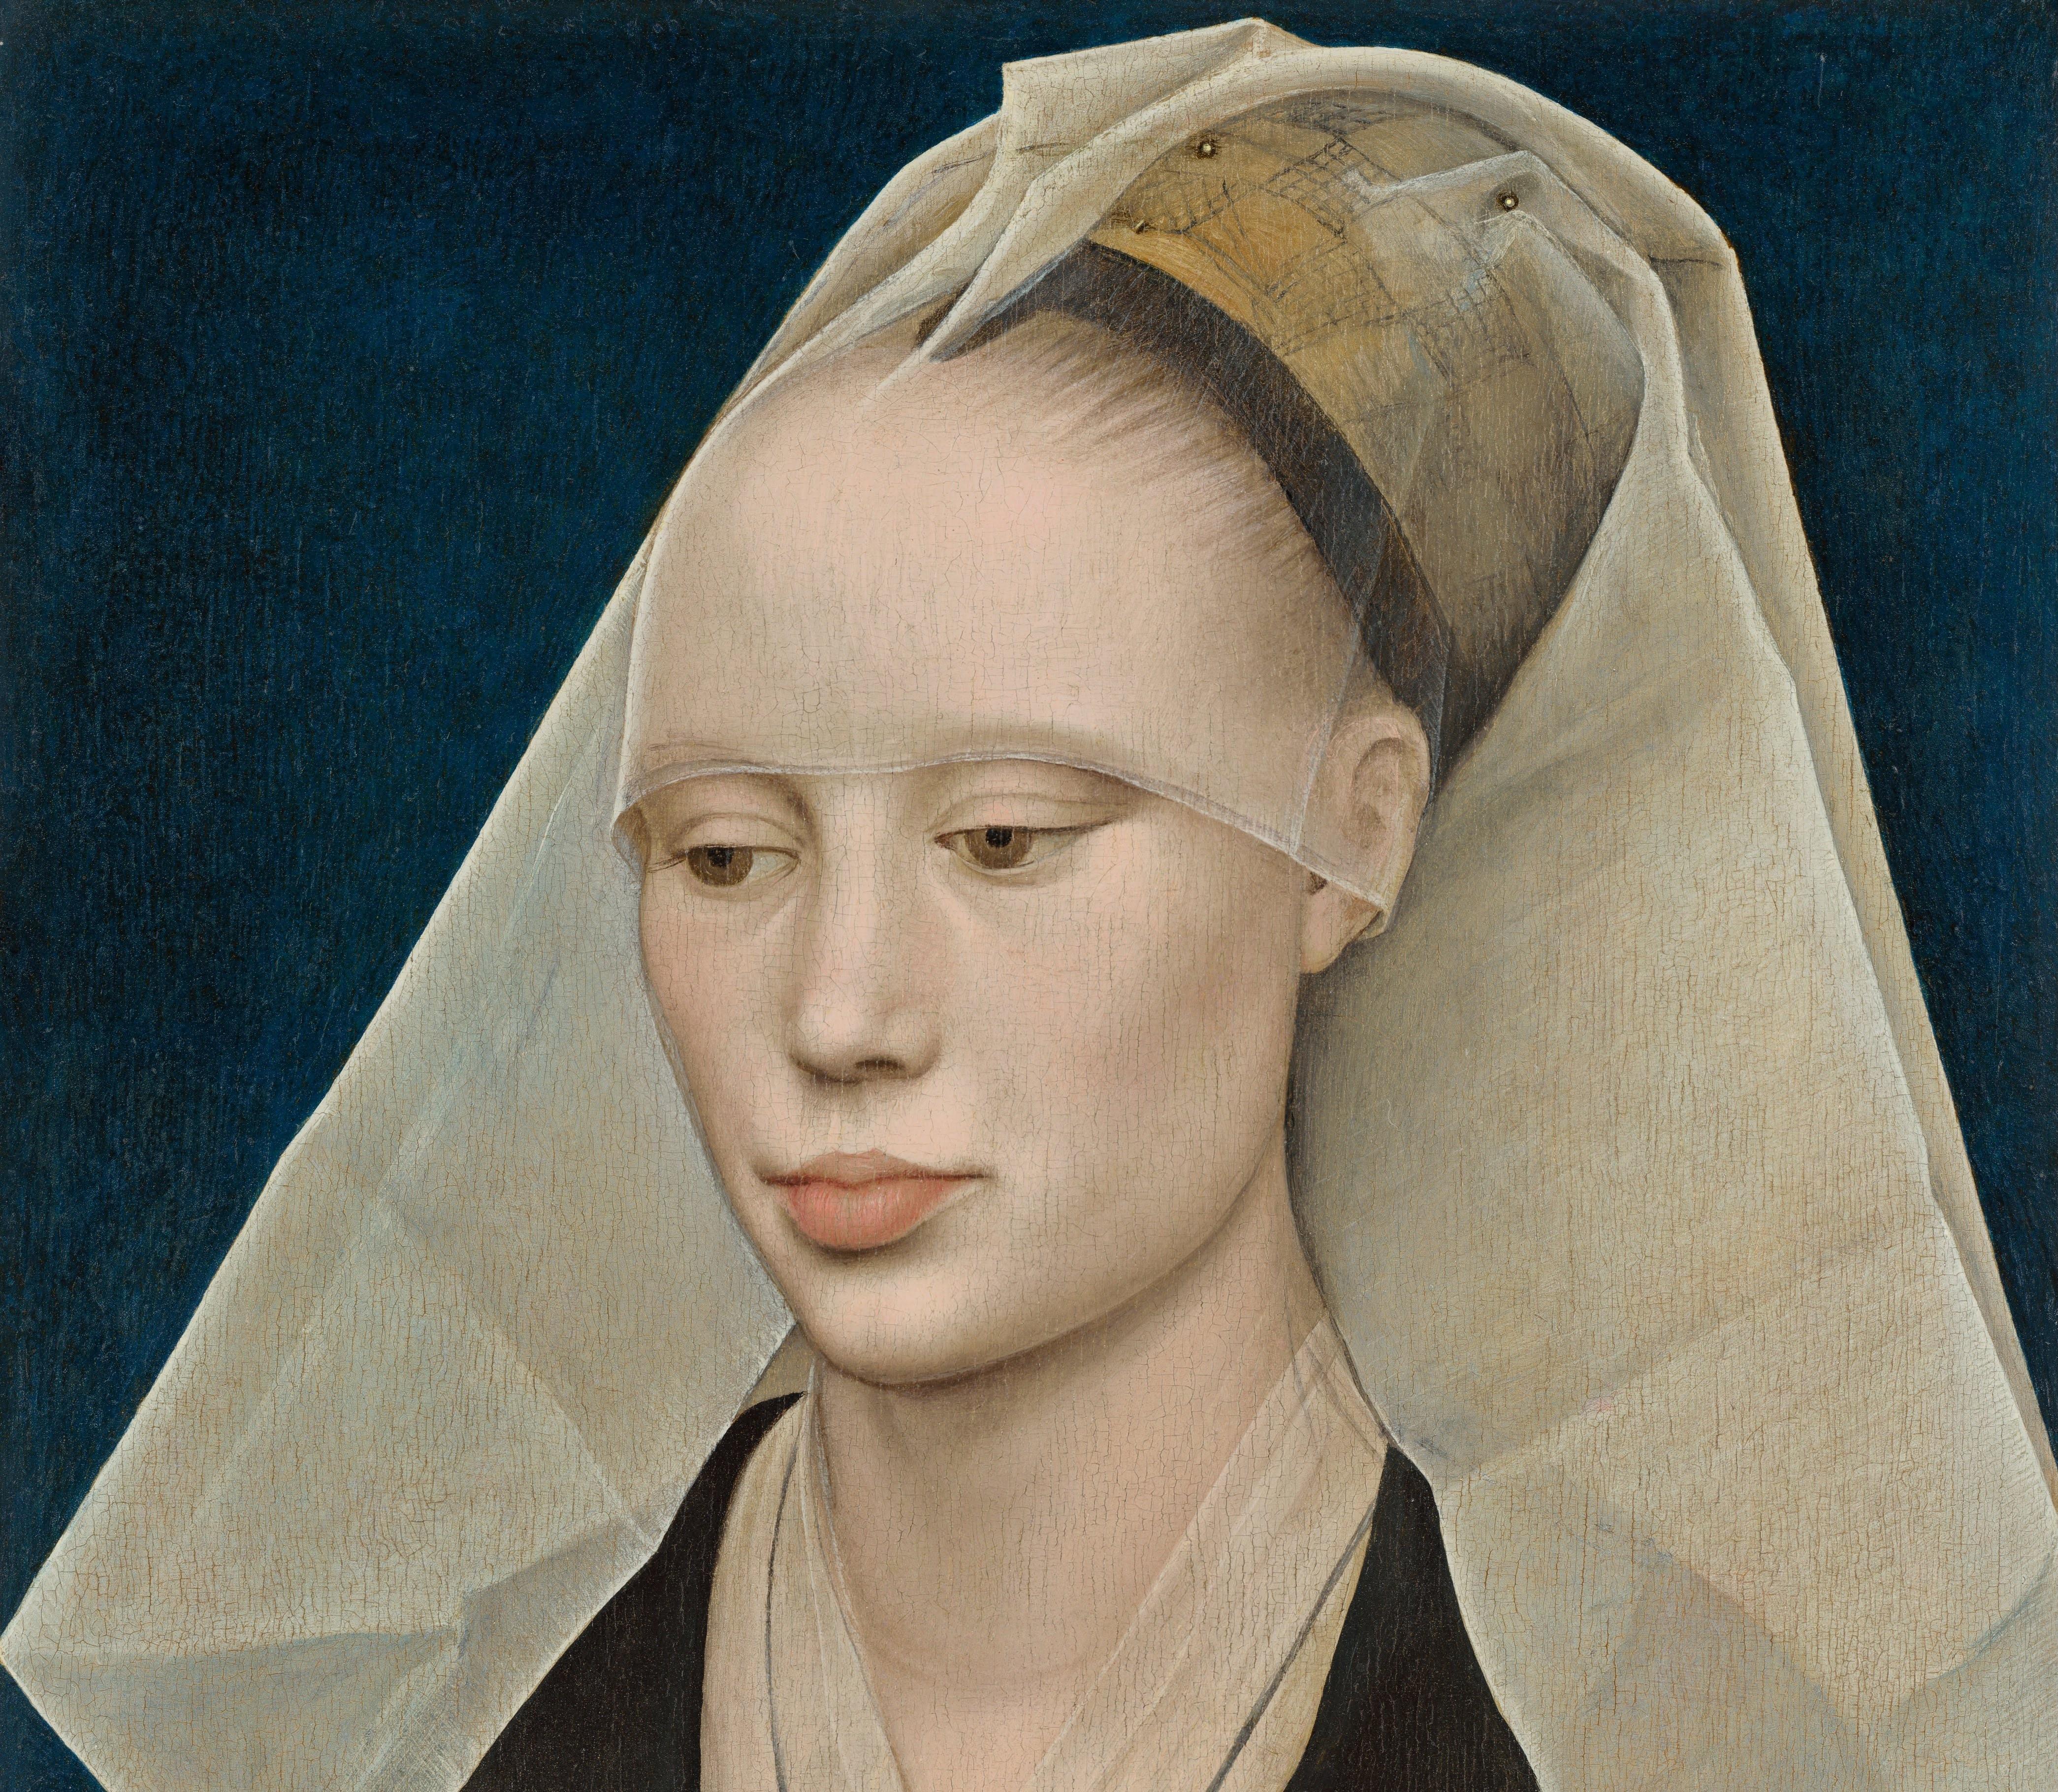 rogier_van_der_weyden_portrait_of_a_lady_google_art_project.jpg